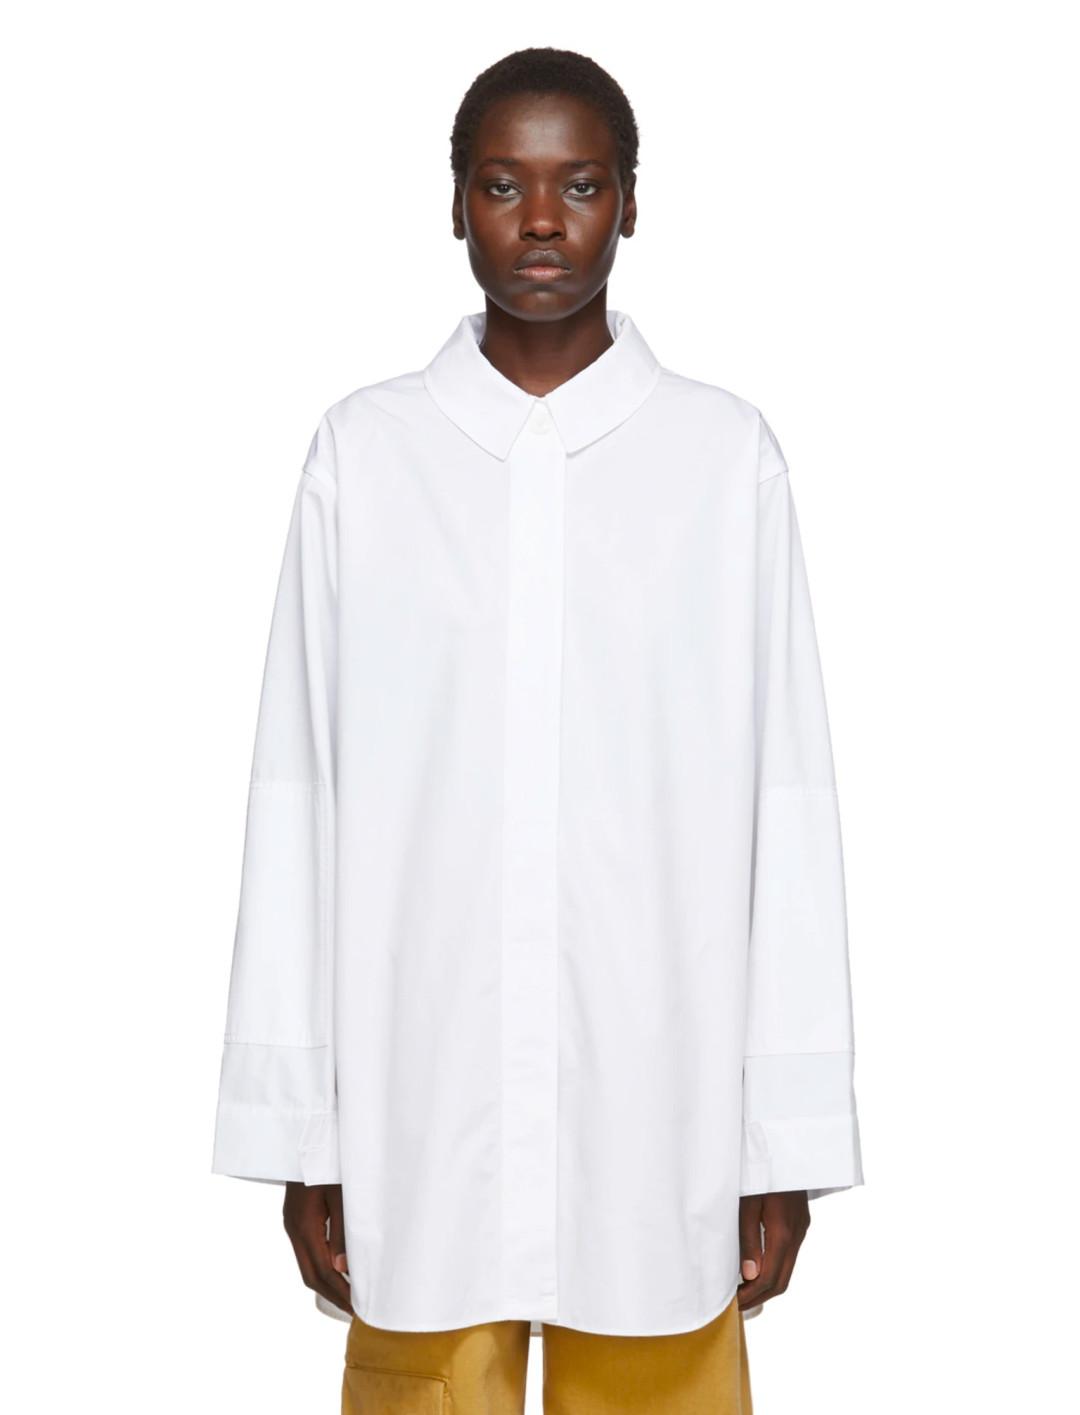 Loya Shirt Clothing